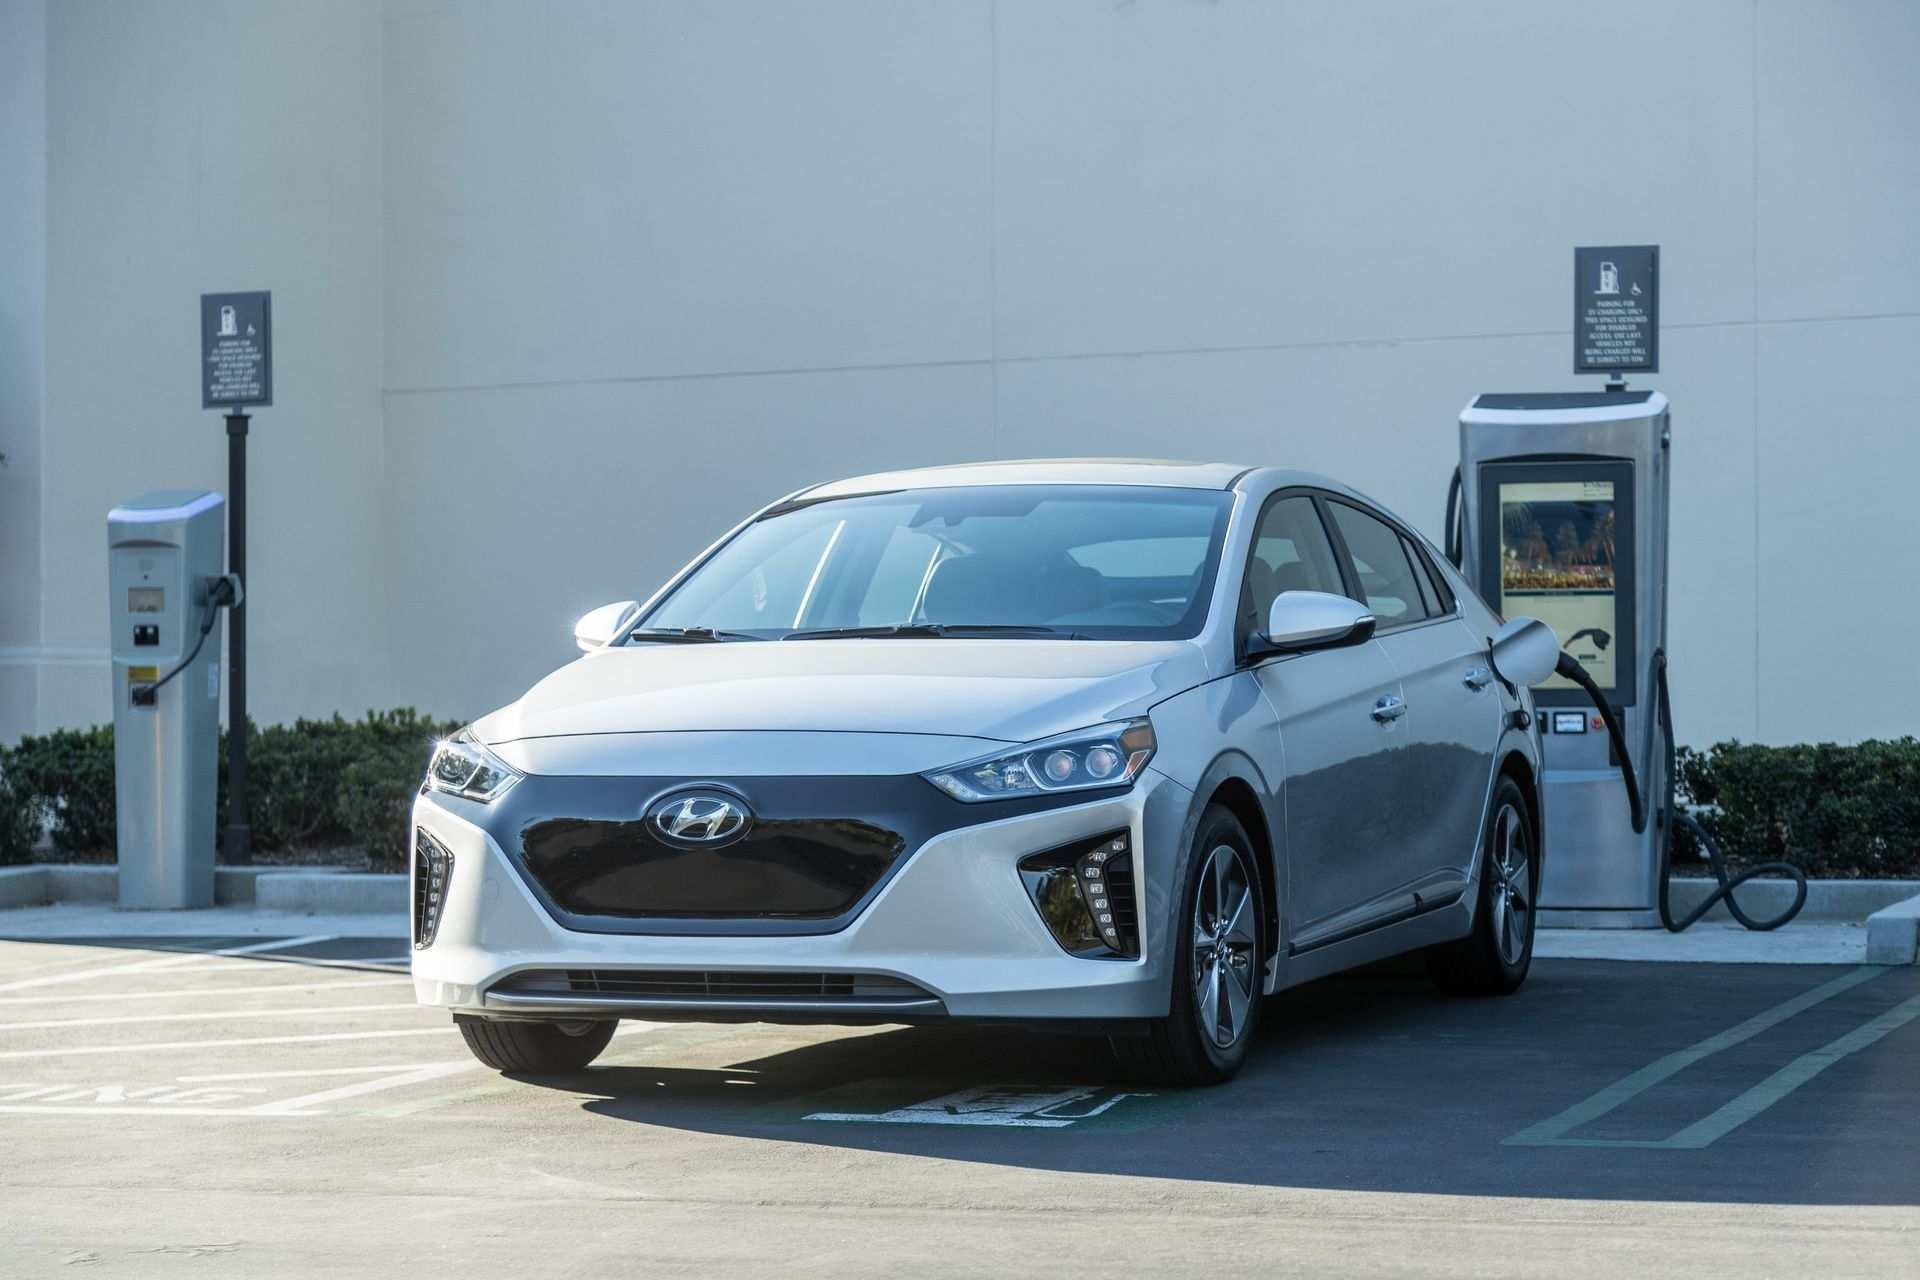 98 The 2019 Hyundai Ioniq Electric Ratings for 2019 Hyundai Ioniq Electric